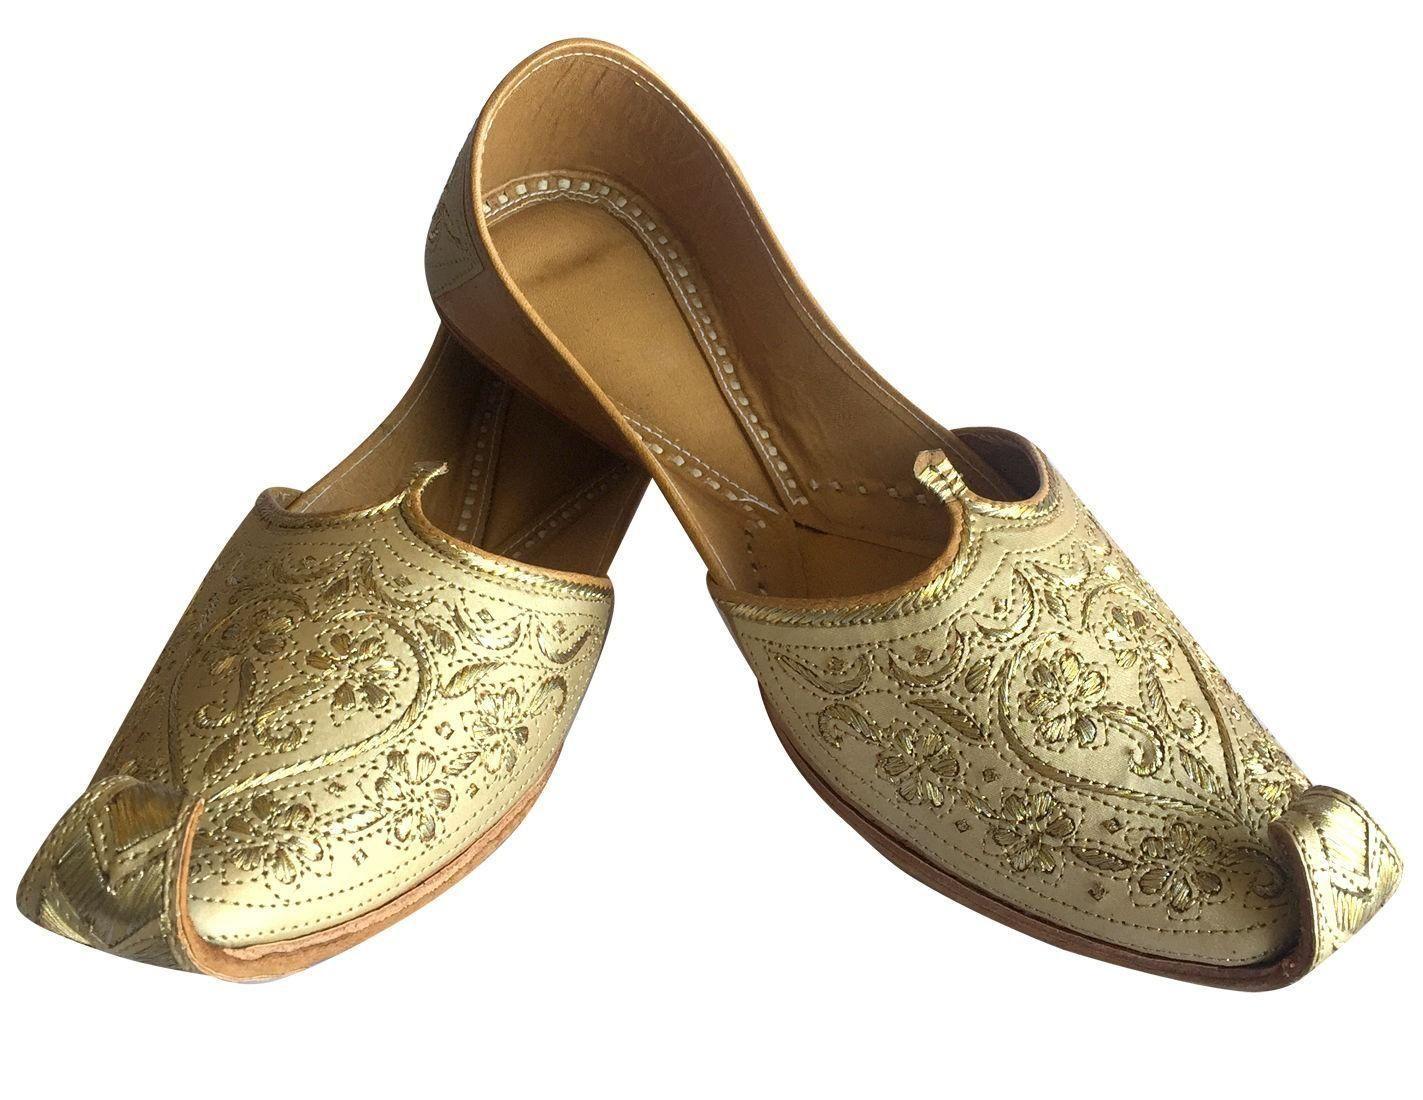 Mens Formal Casual Shoes Pakisatani Style Khussa Maharaja Style Jutti Jooti